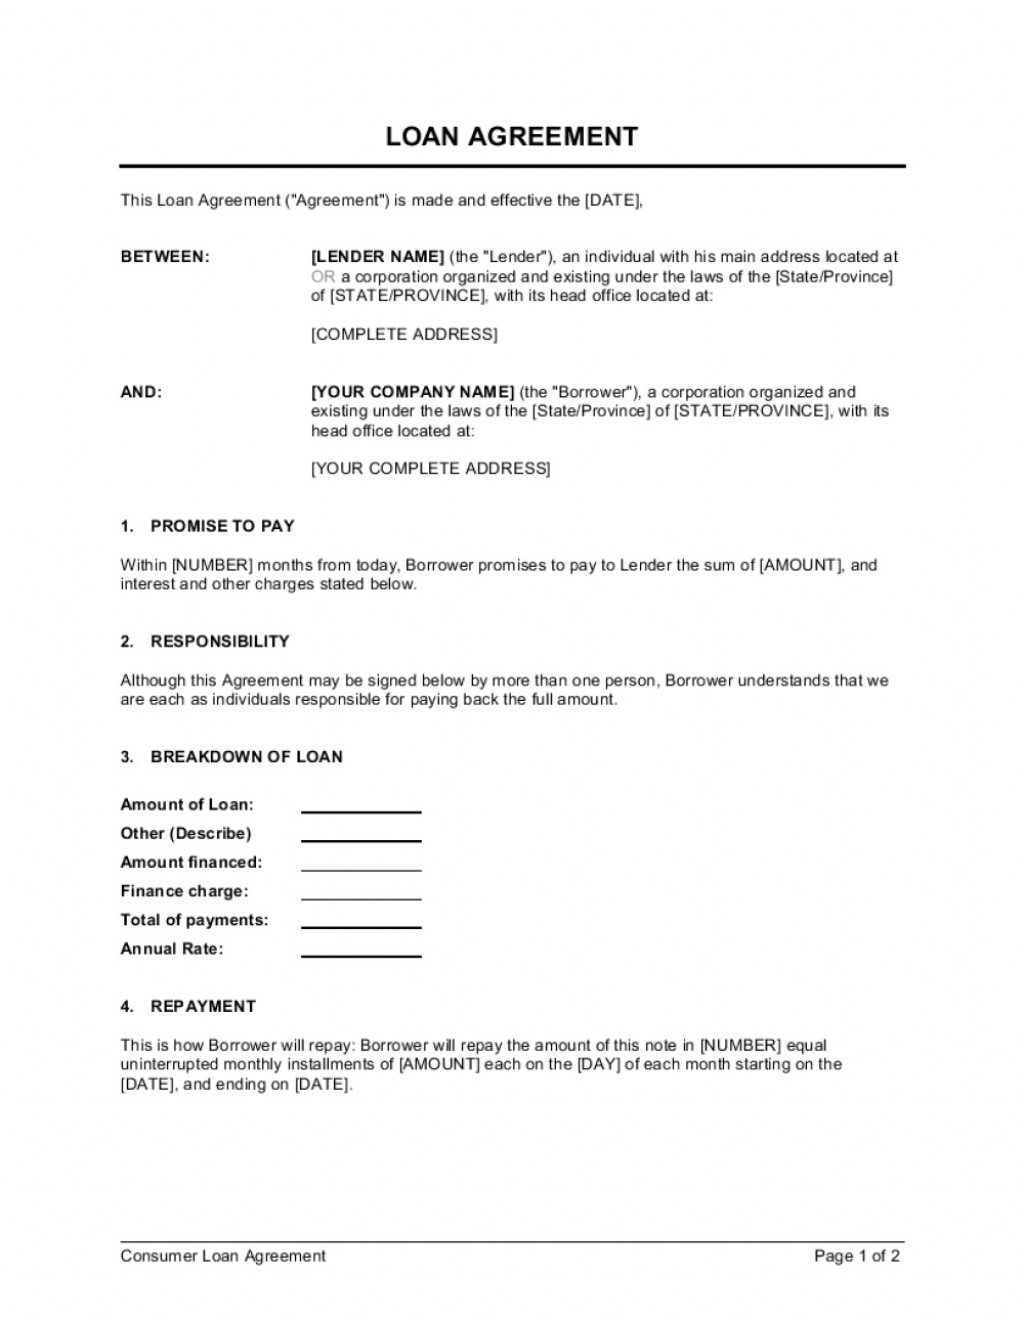 004 Singular Loan Agreement Template Free Photo  Word Nz Family UkLarge